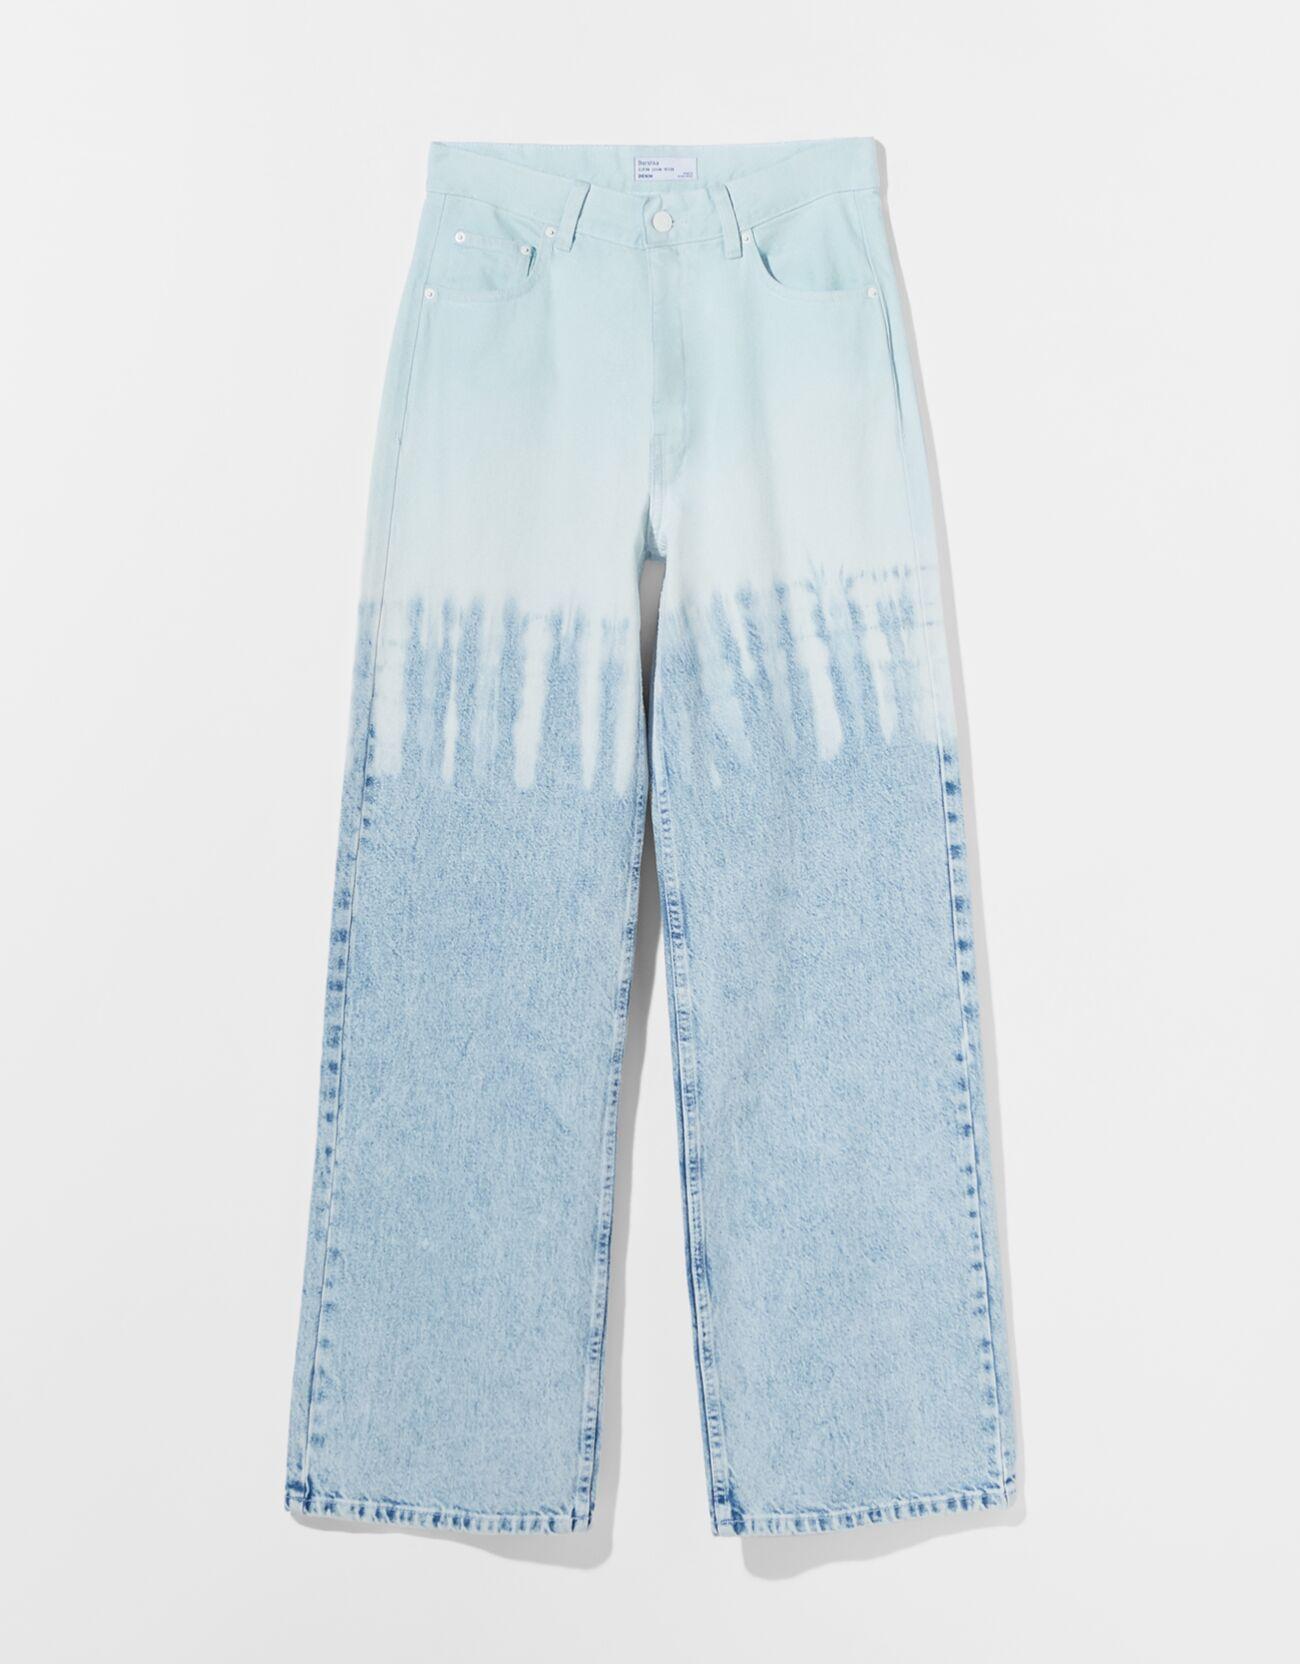 Jeans 90's efecto tie dye.